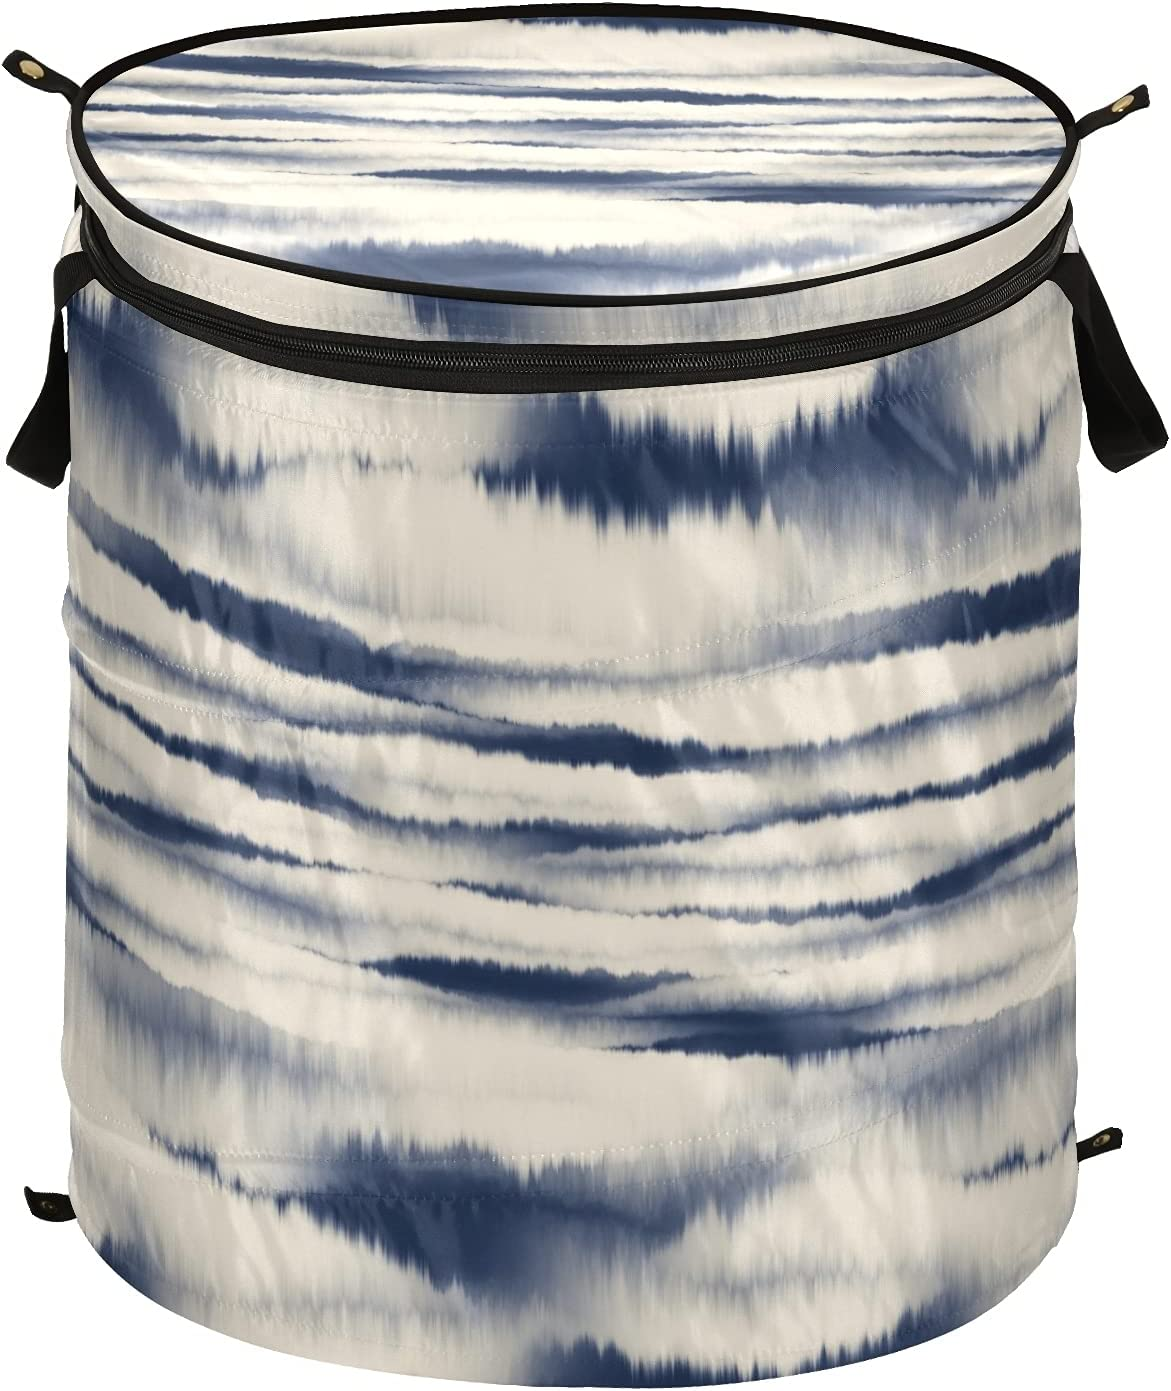 Ultra-Cheap Deals Tie Dye Pop-Up Laundry Hamper Storage with Lid Ba Zipper OFFicial site